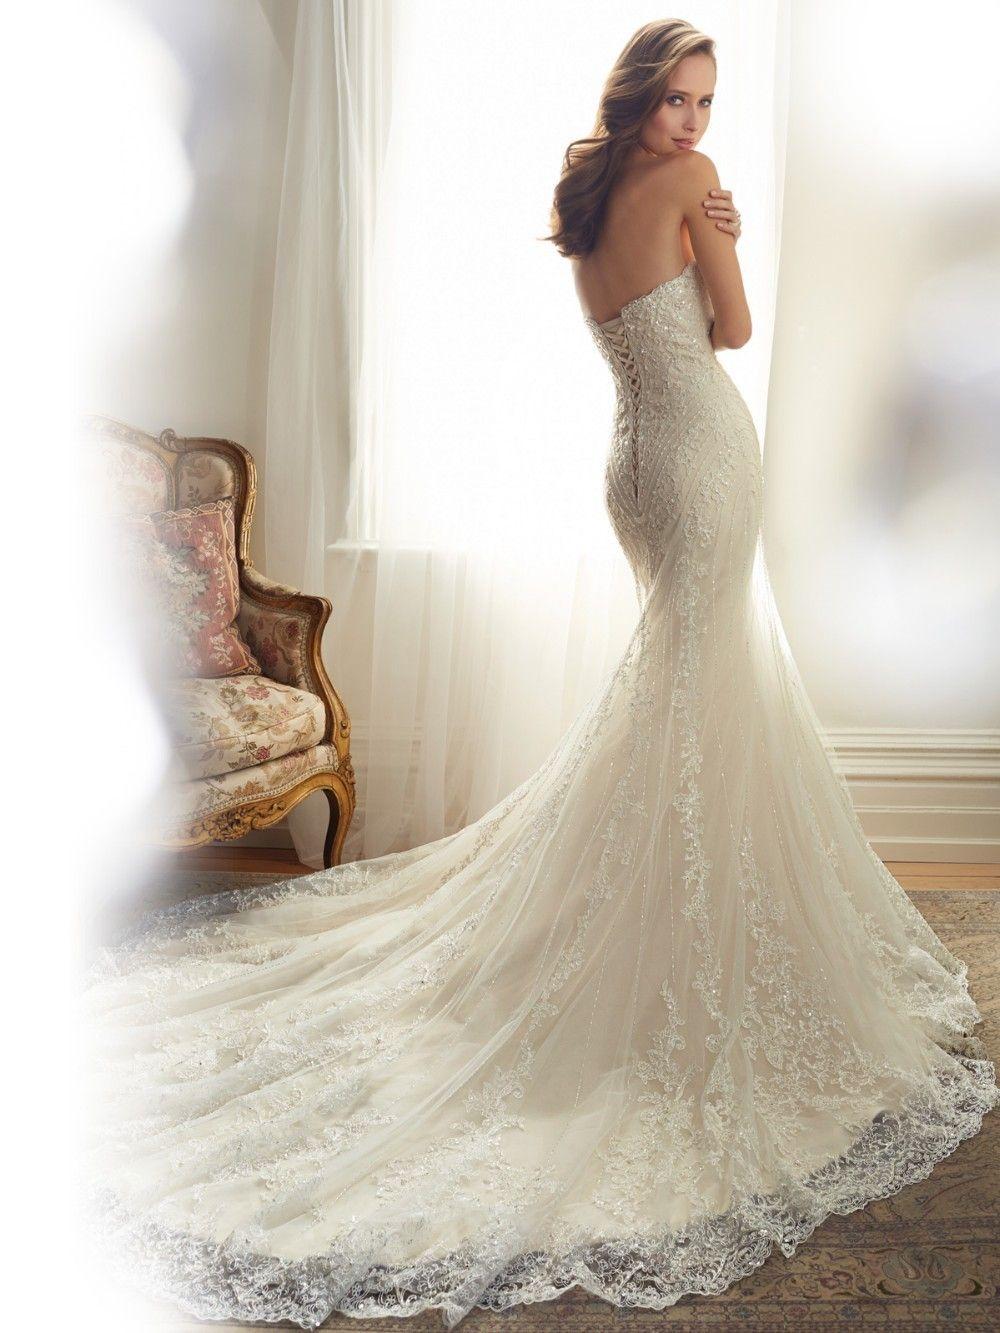 Strapless Lace Up Back Crystal Beading Appliques Lace Mermaid Wedding Dress Uniqistic Com Mermaid Wedding Dress Wedding Dress Styles Online Wedding Dress [ 1333 x 1000 Pixel ]